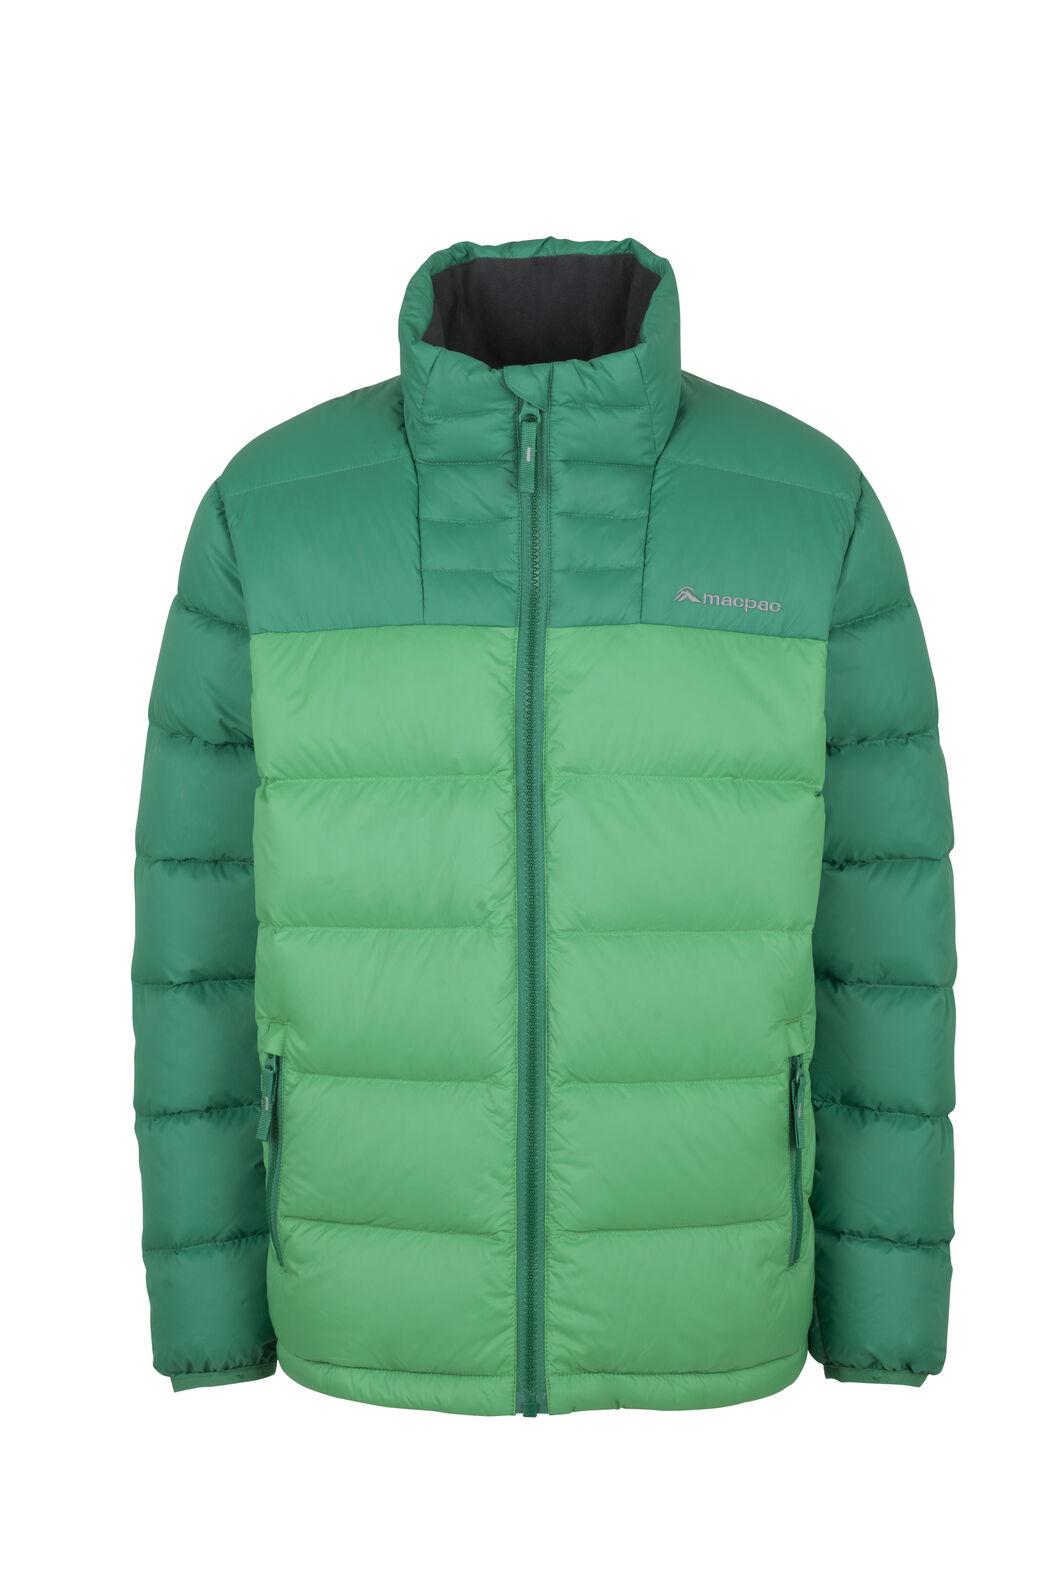 Macpac Atom Down Jacket - Kids', Bospherus/Bright Green, hi-res